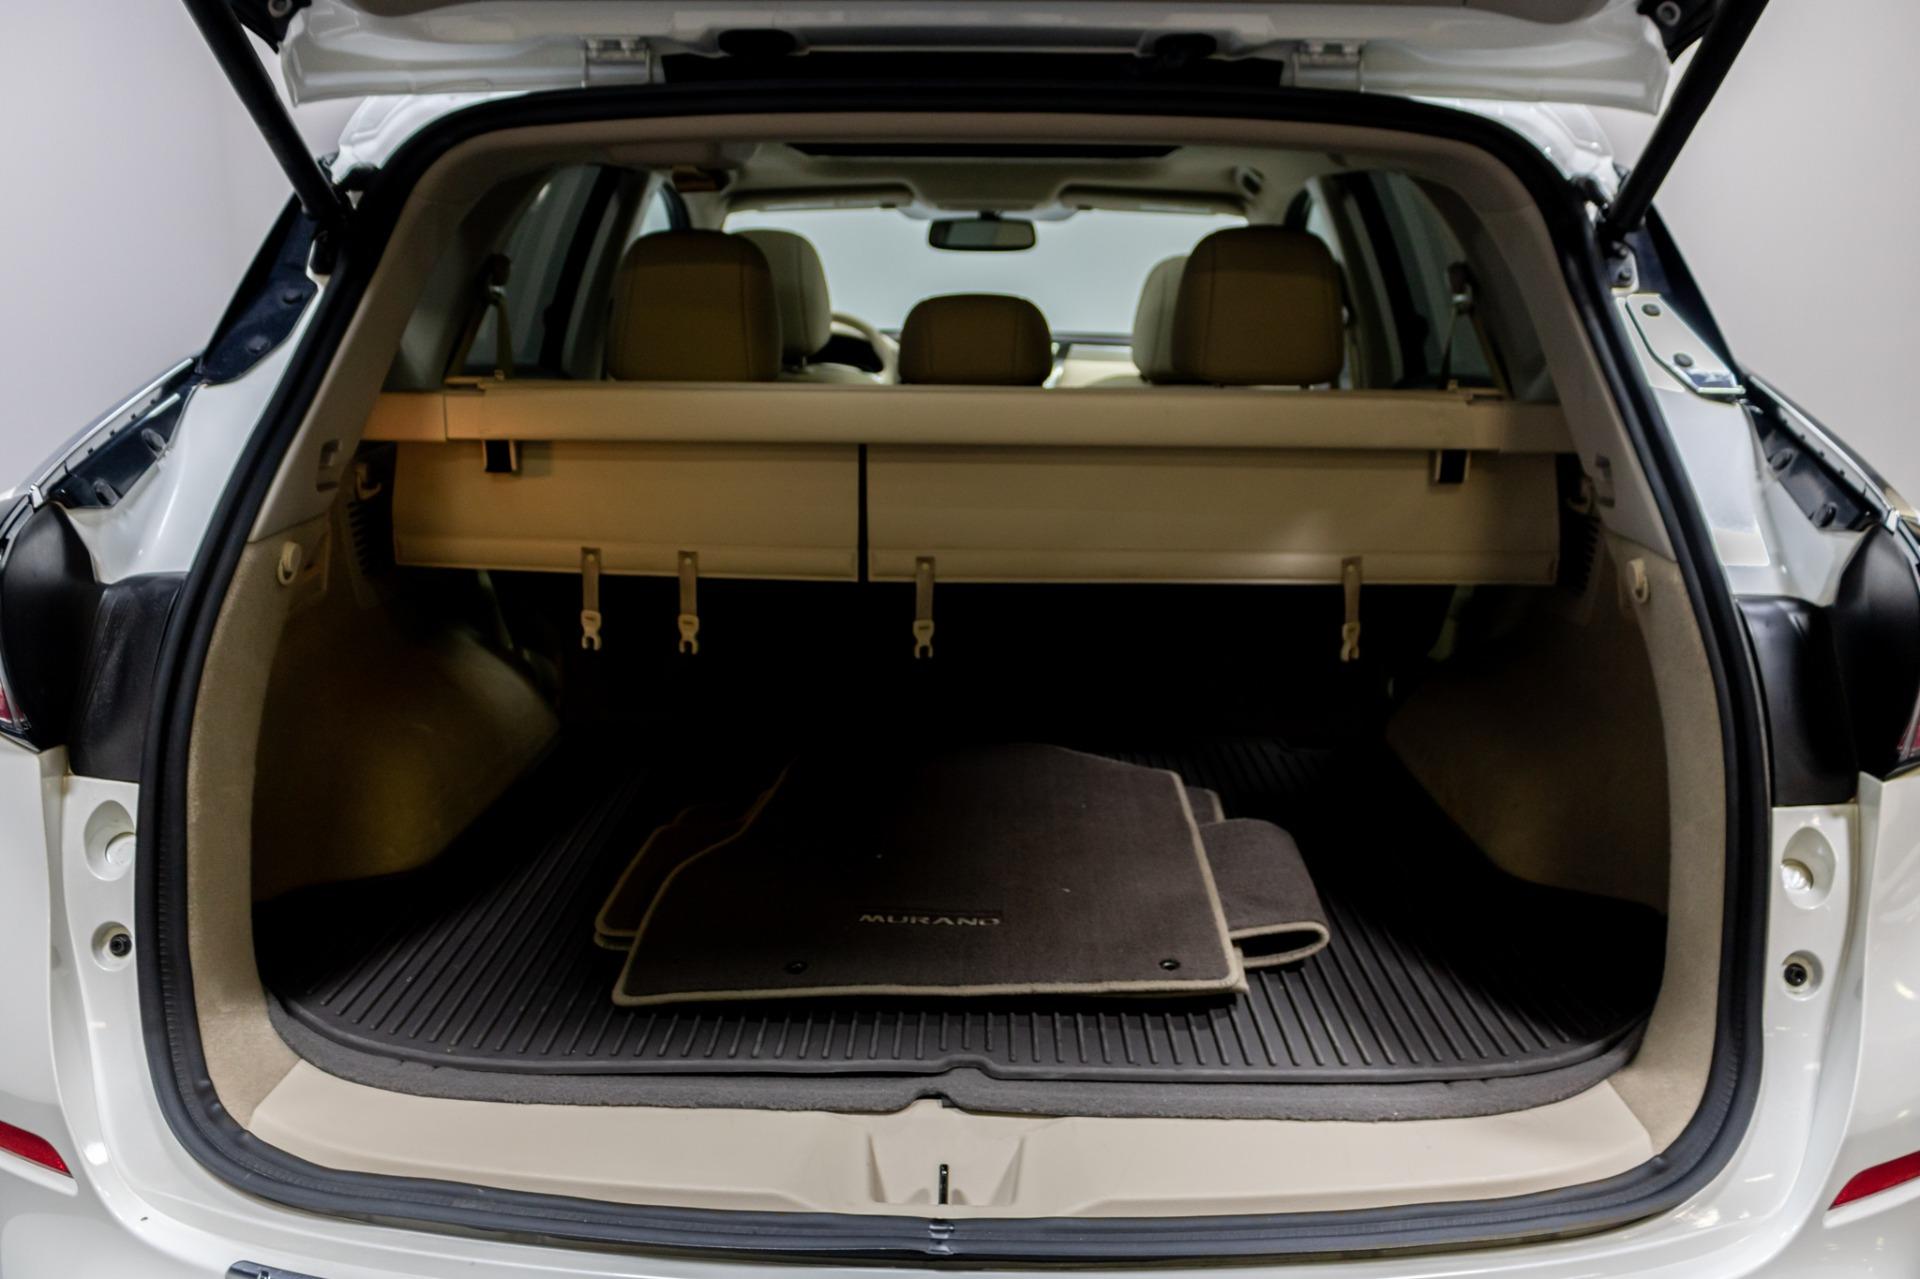 Used 2018 Nissan Murano Platinum Sport Utility 4D